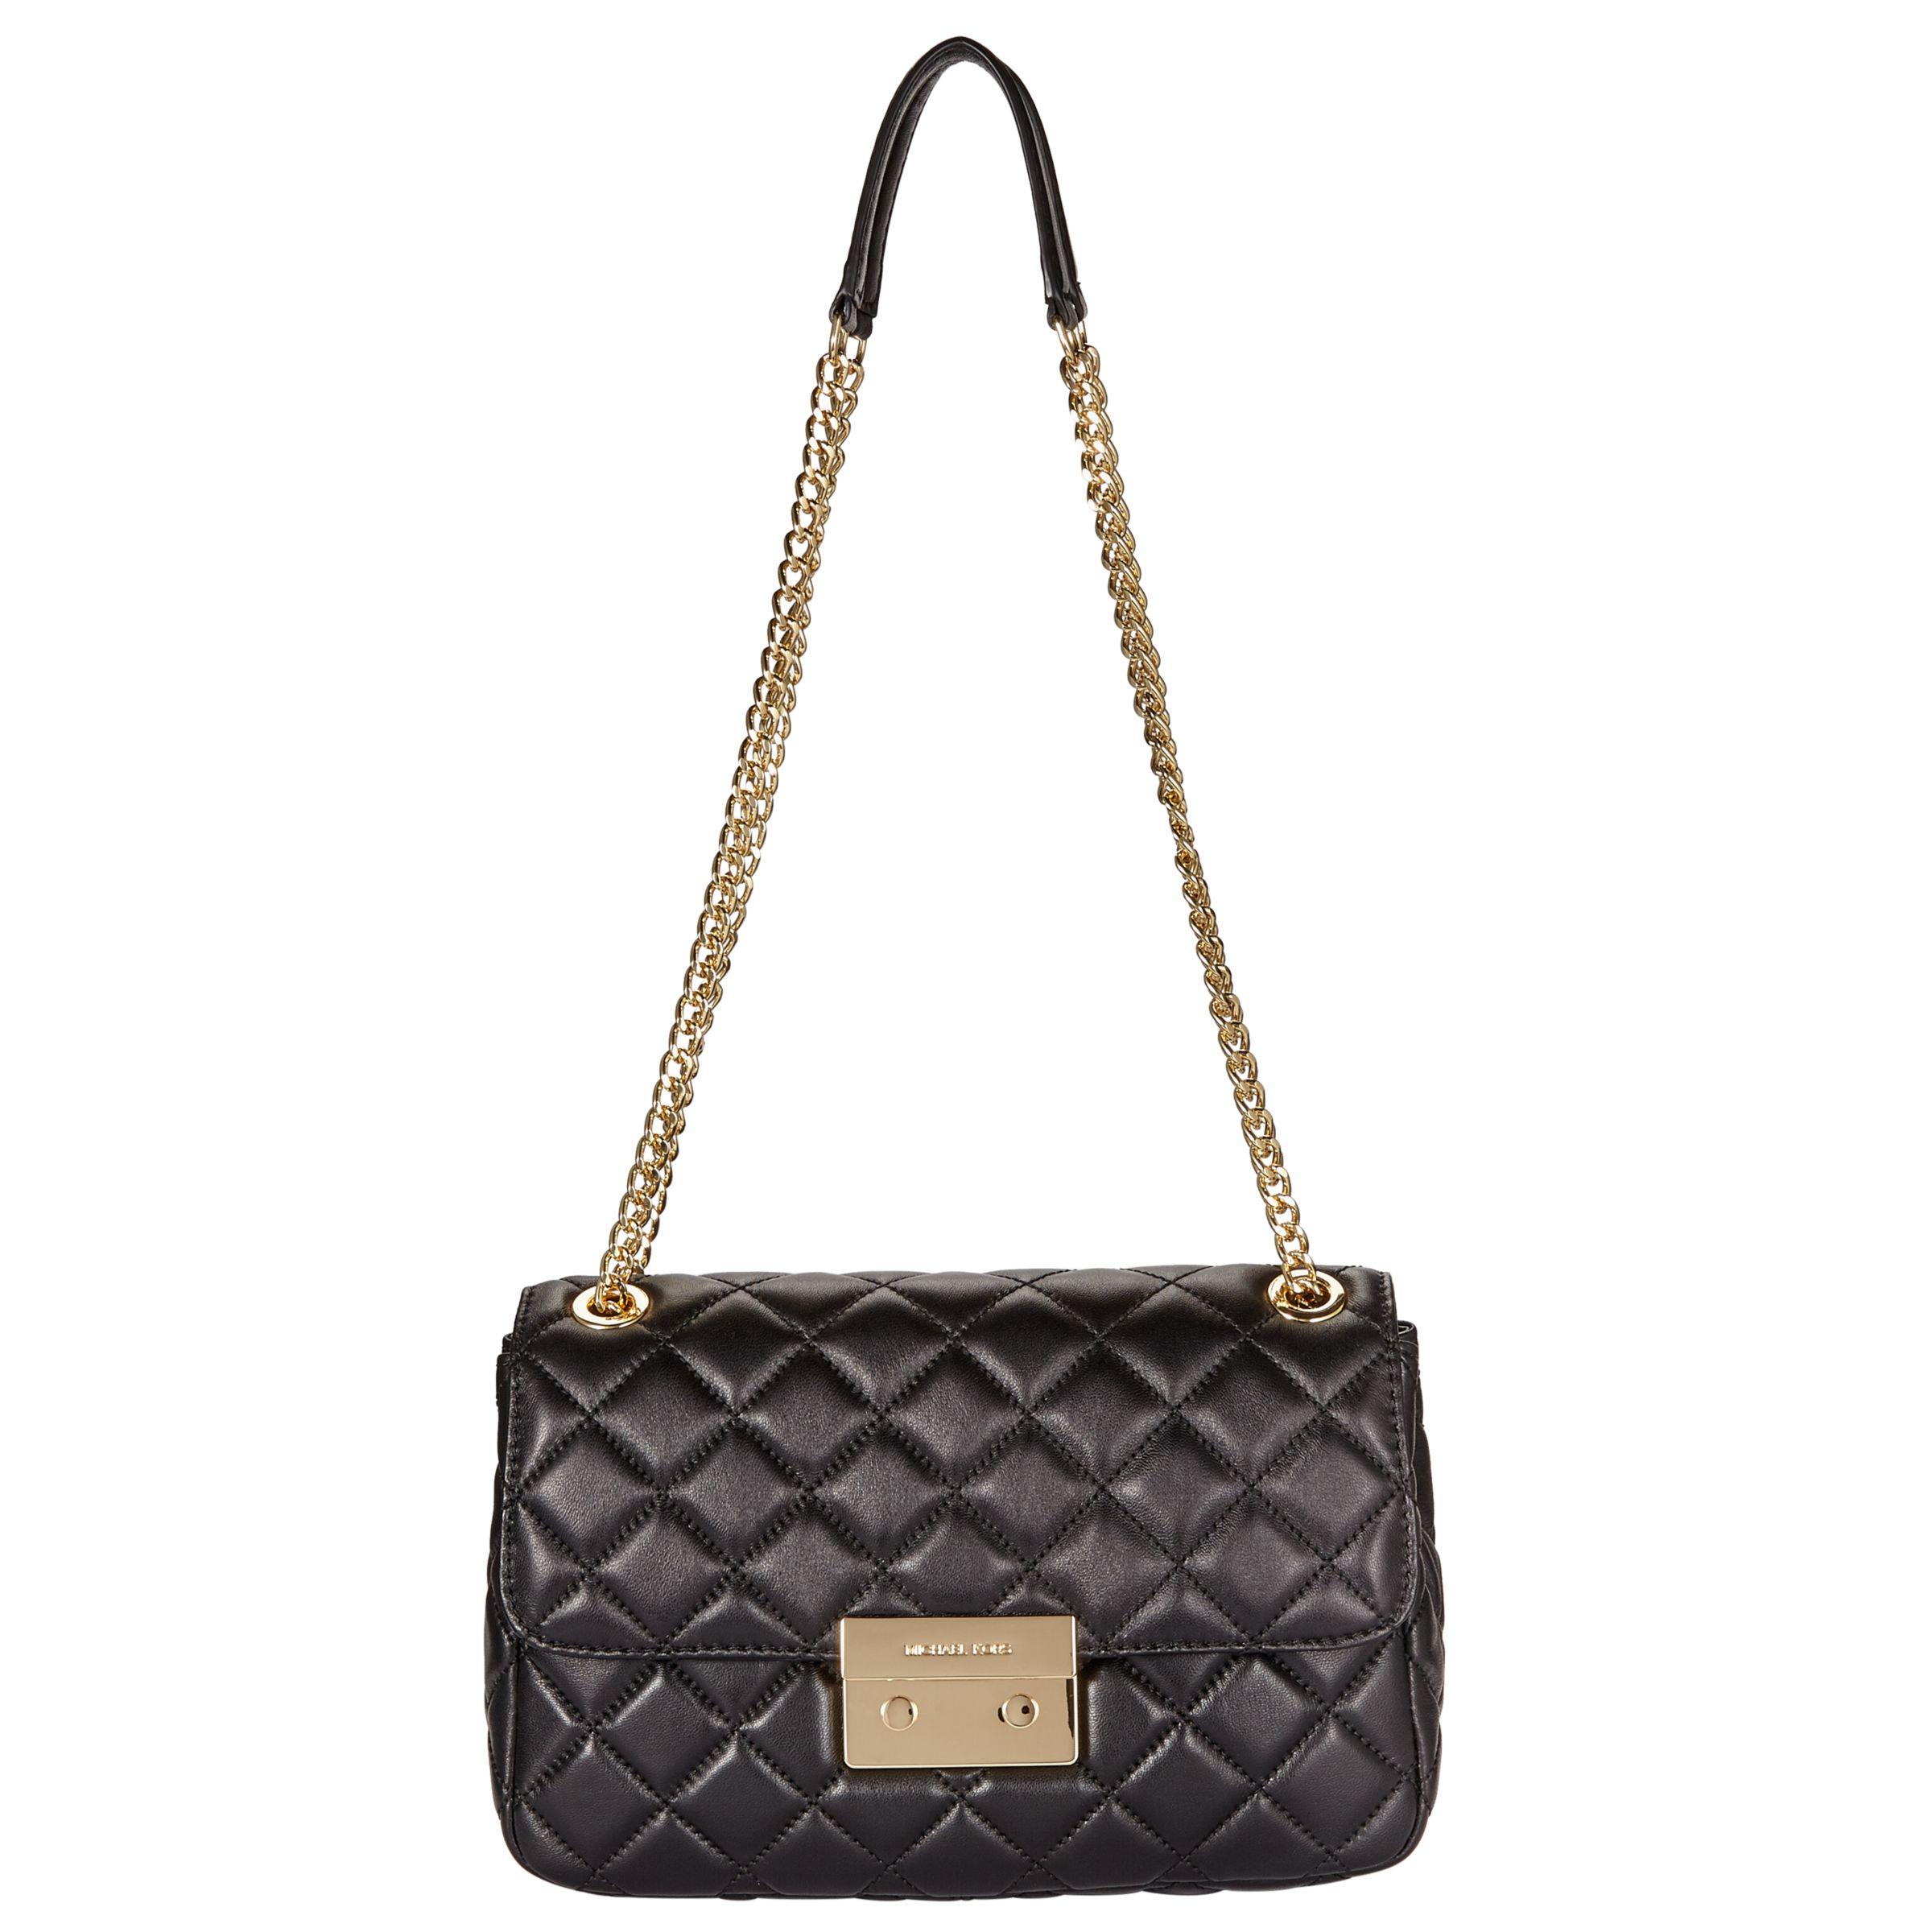 7cf4eb390 MICHAEL Michael Kors Sloan Large Leather Chain Shoulder Bag at John Lewis &  Partners